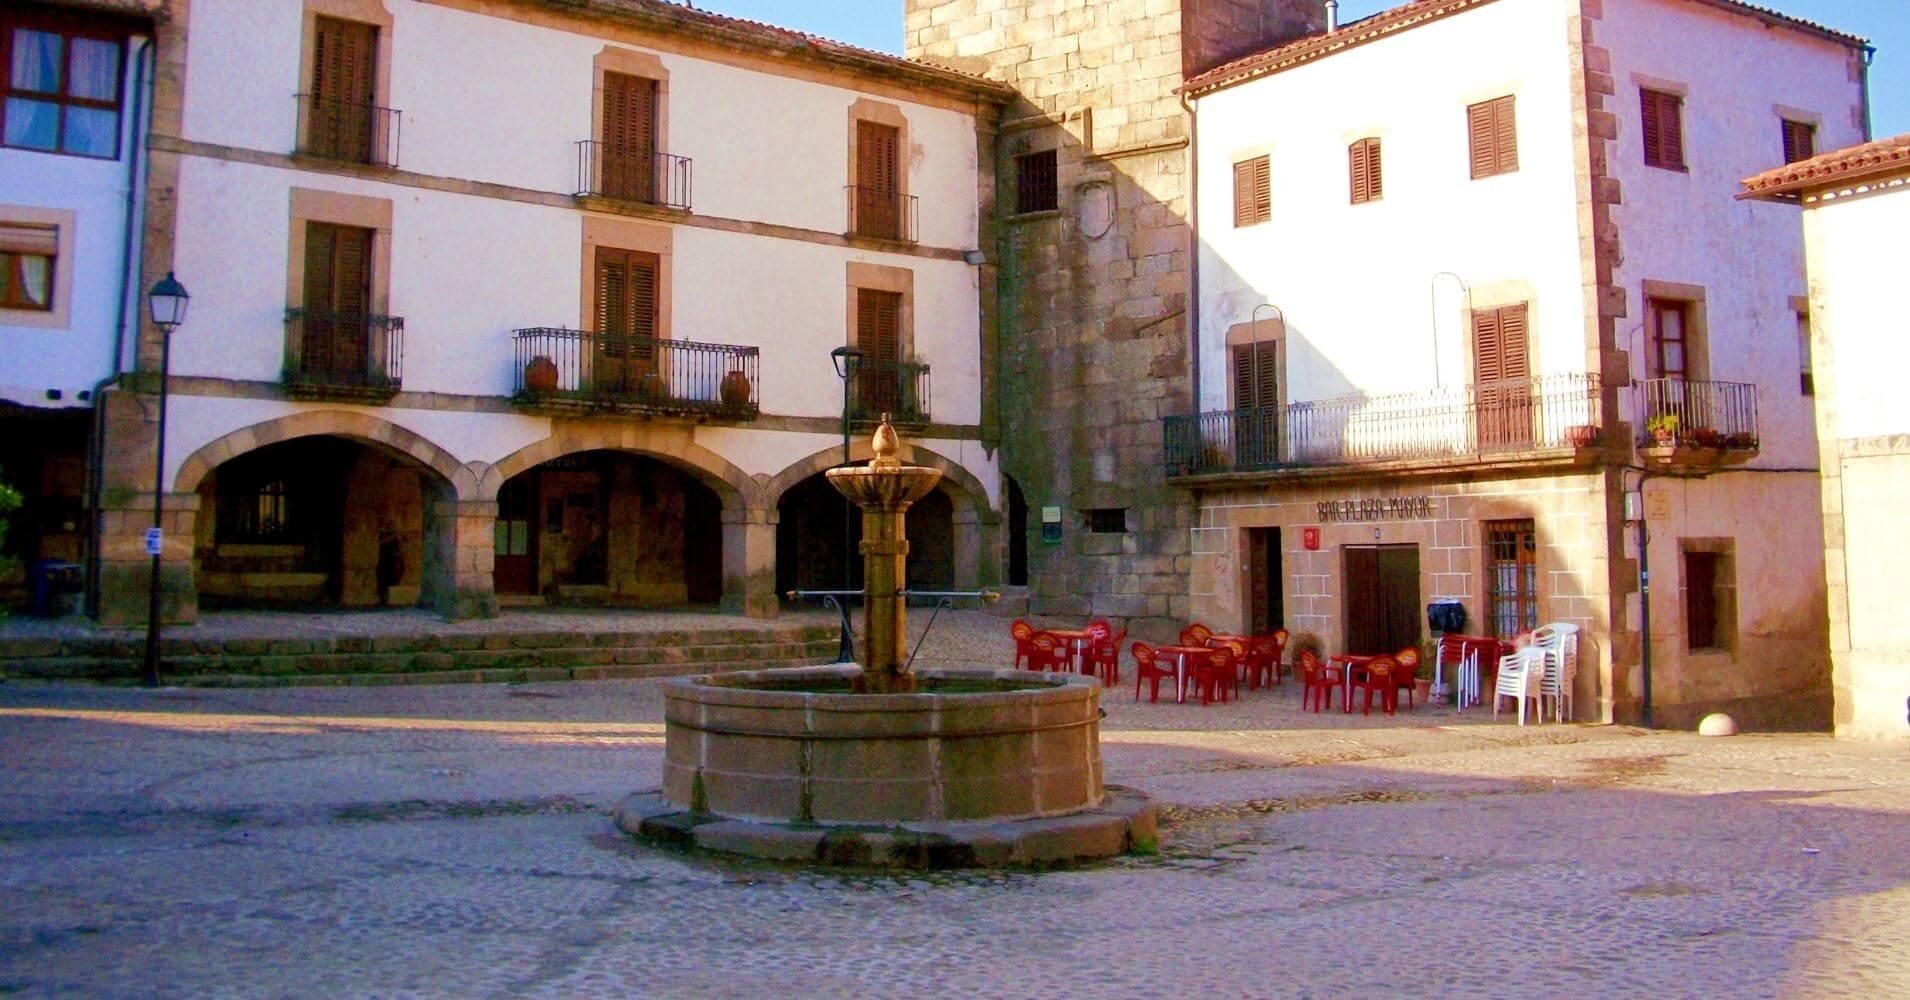 Plaza de San Martín de Trevejo. Sierra de Gata. Cáceres, Extremadura.